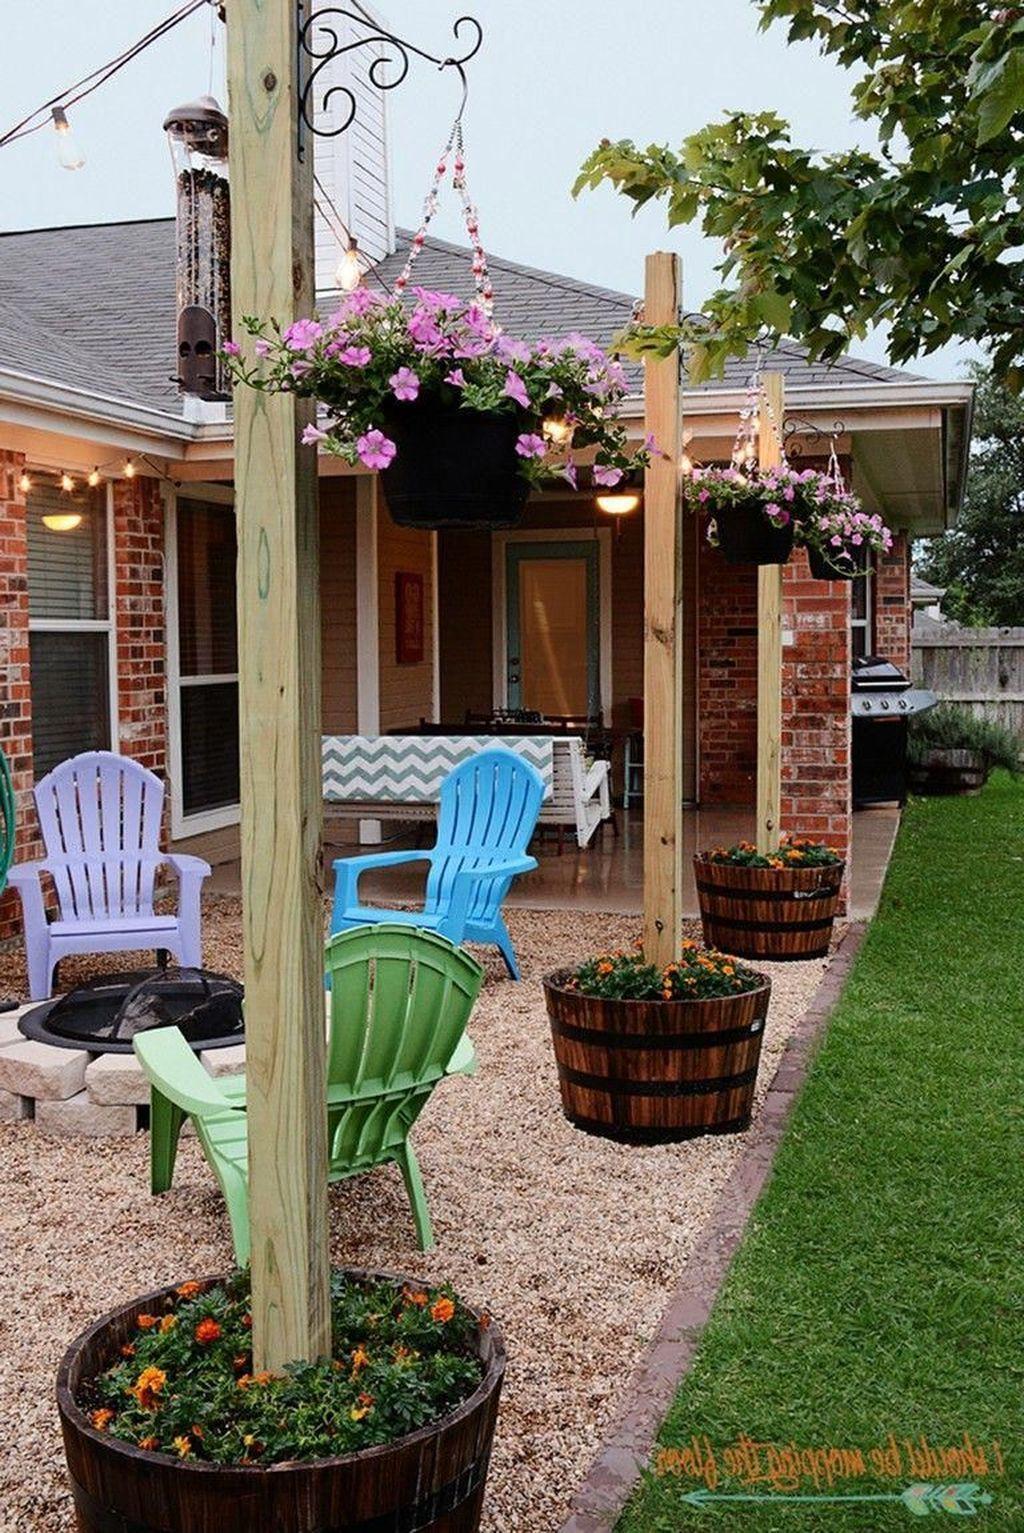 32 Fabulous Patio Design Ideas On A Budget Inexpensive Backyard Ideas Patio Garden Design Large Backyard Landscaping